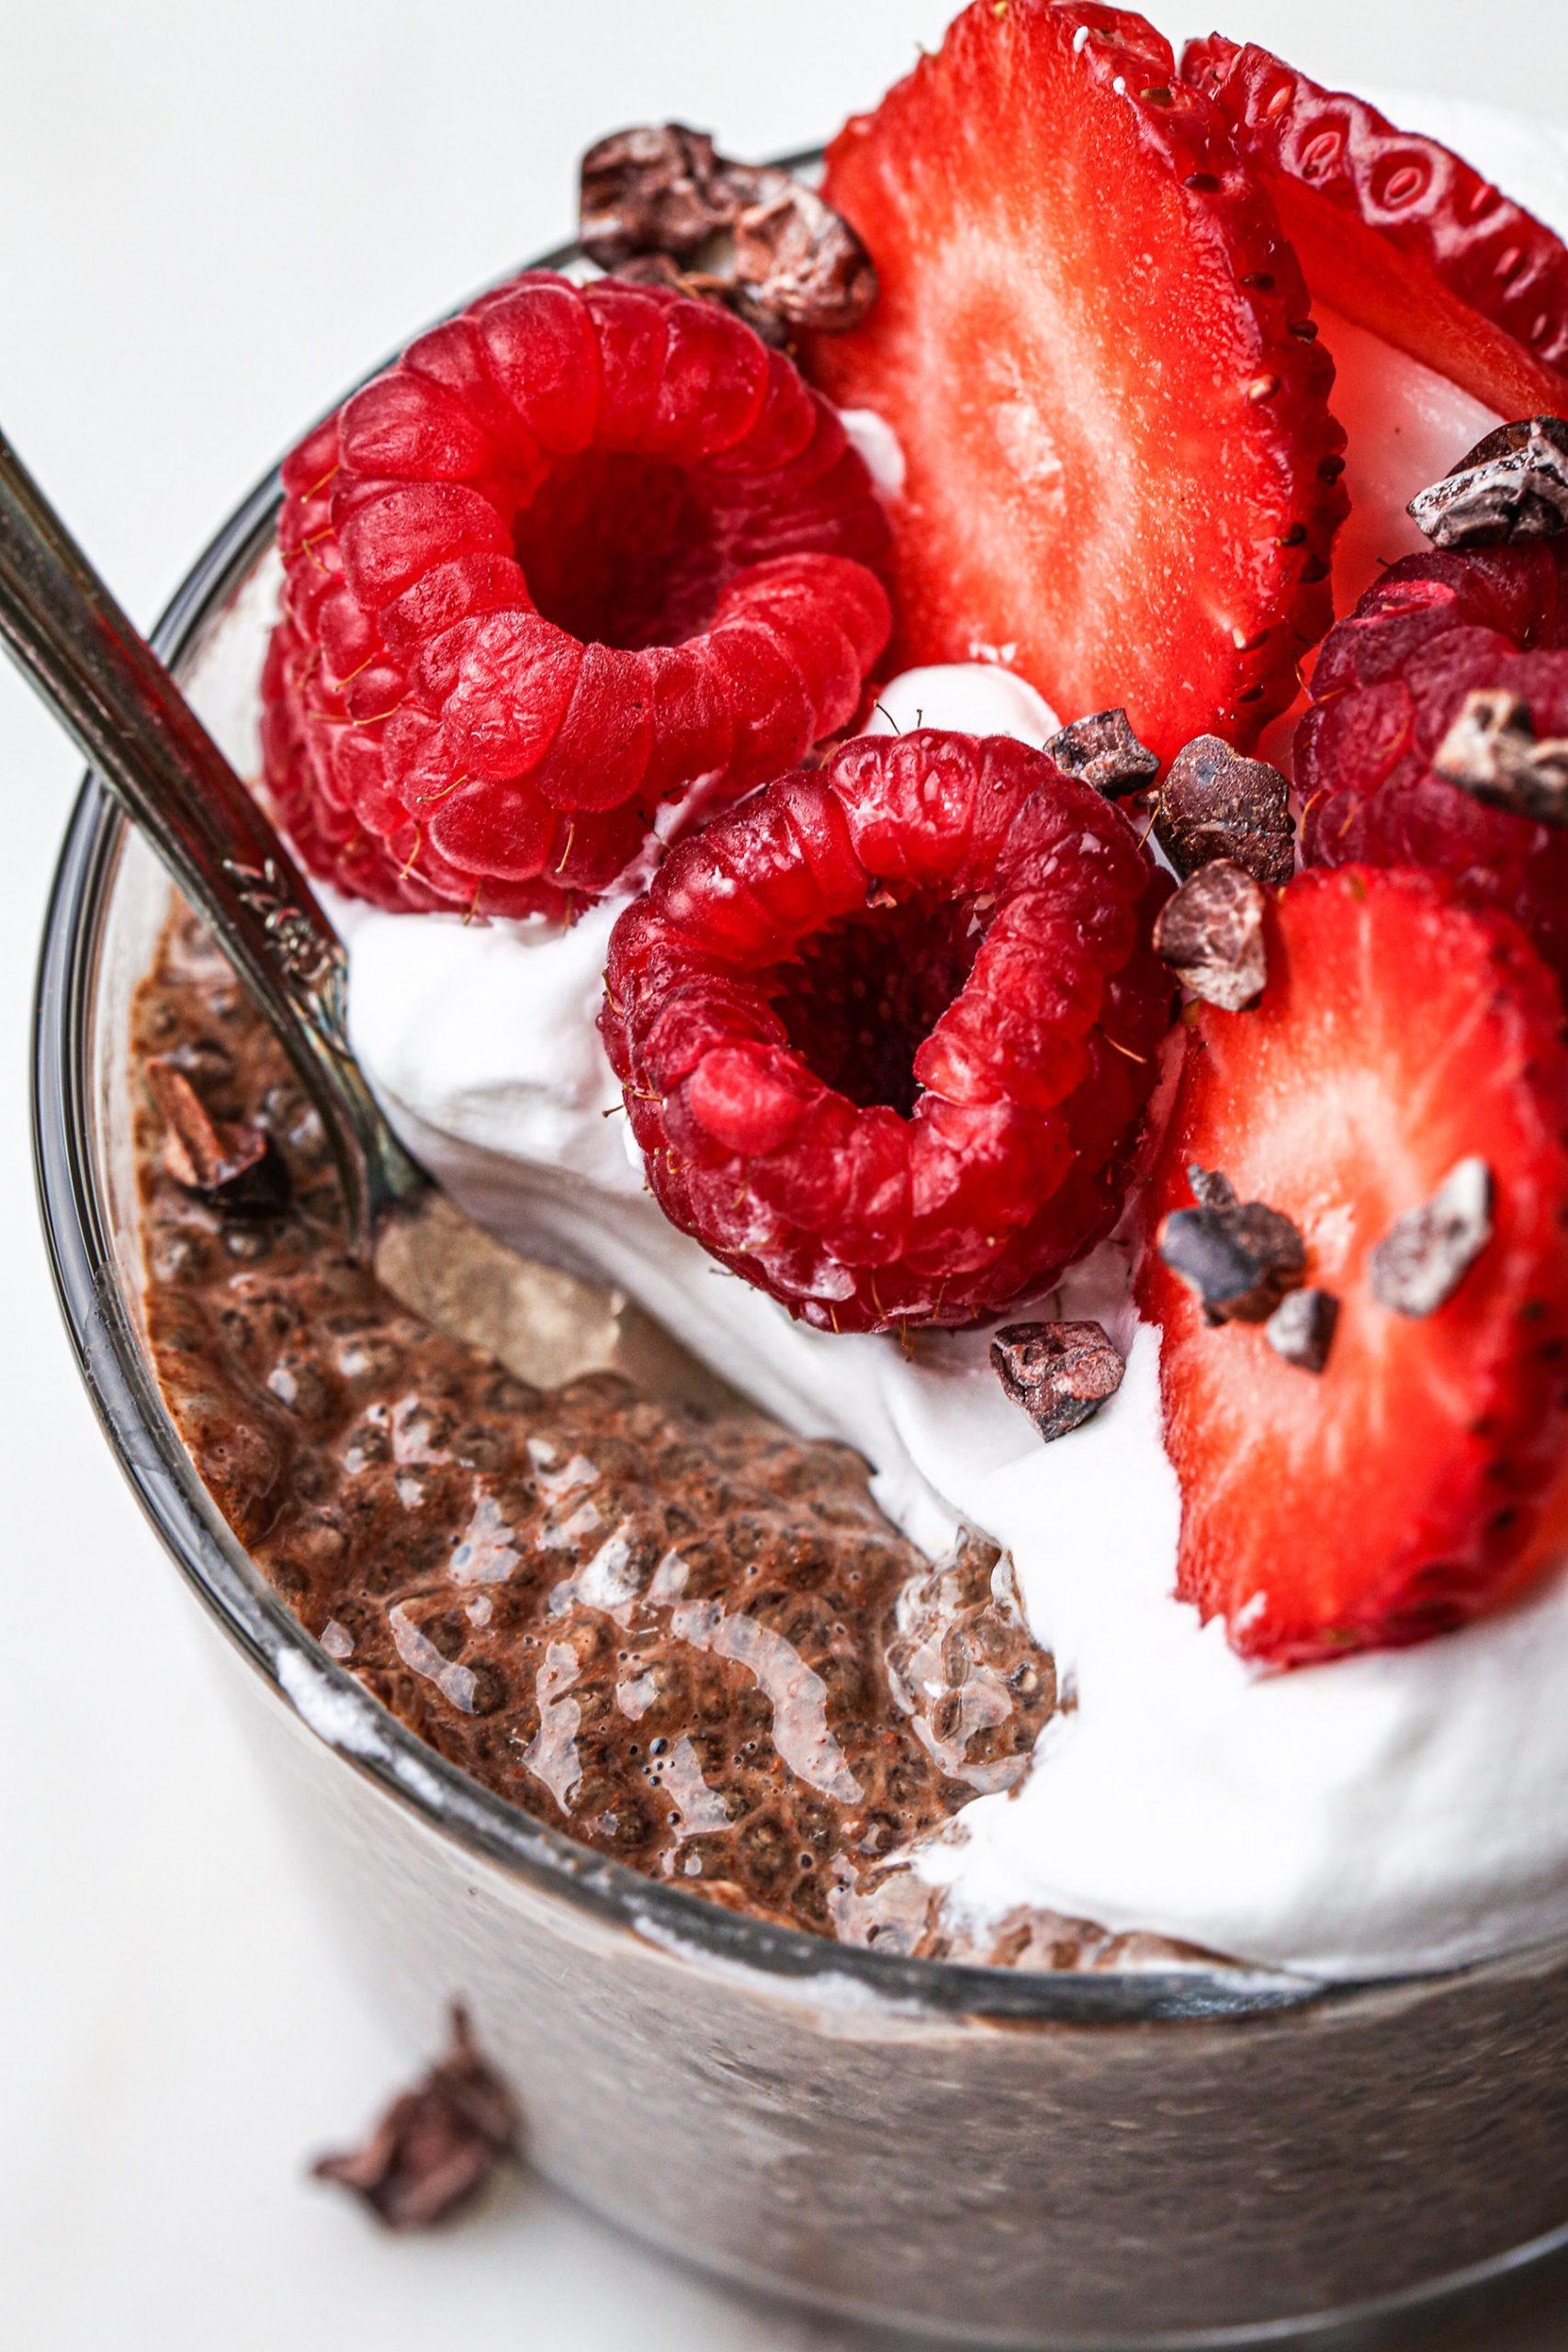 Chocolate Chia Pudding | Grain, gluten, dairy, and refined sugar free. Paleo and vegan friendly.